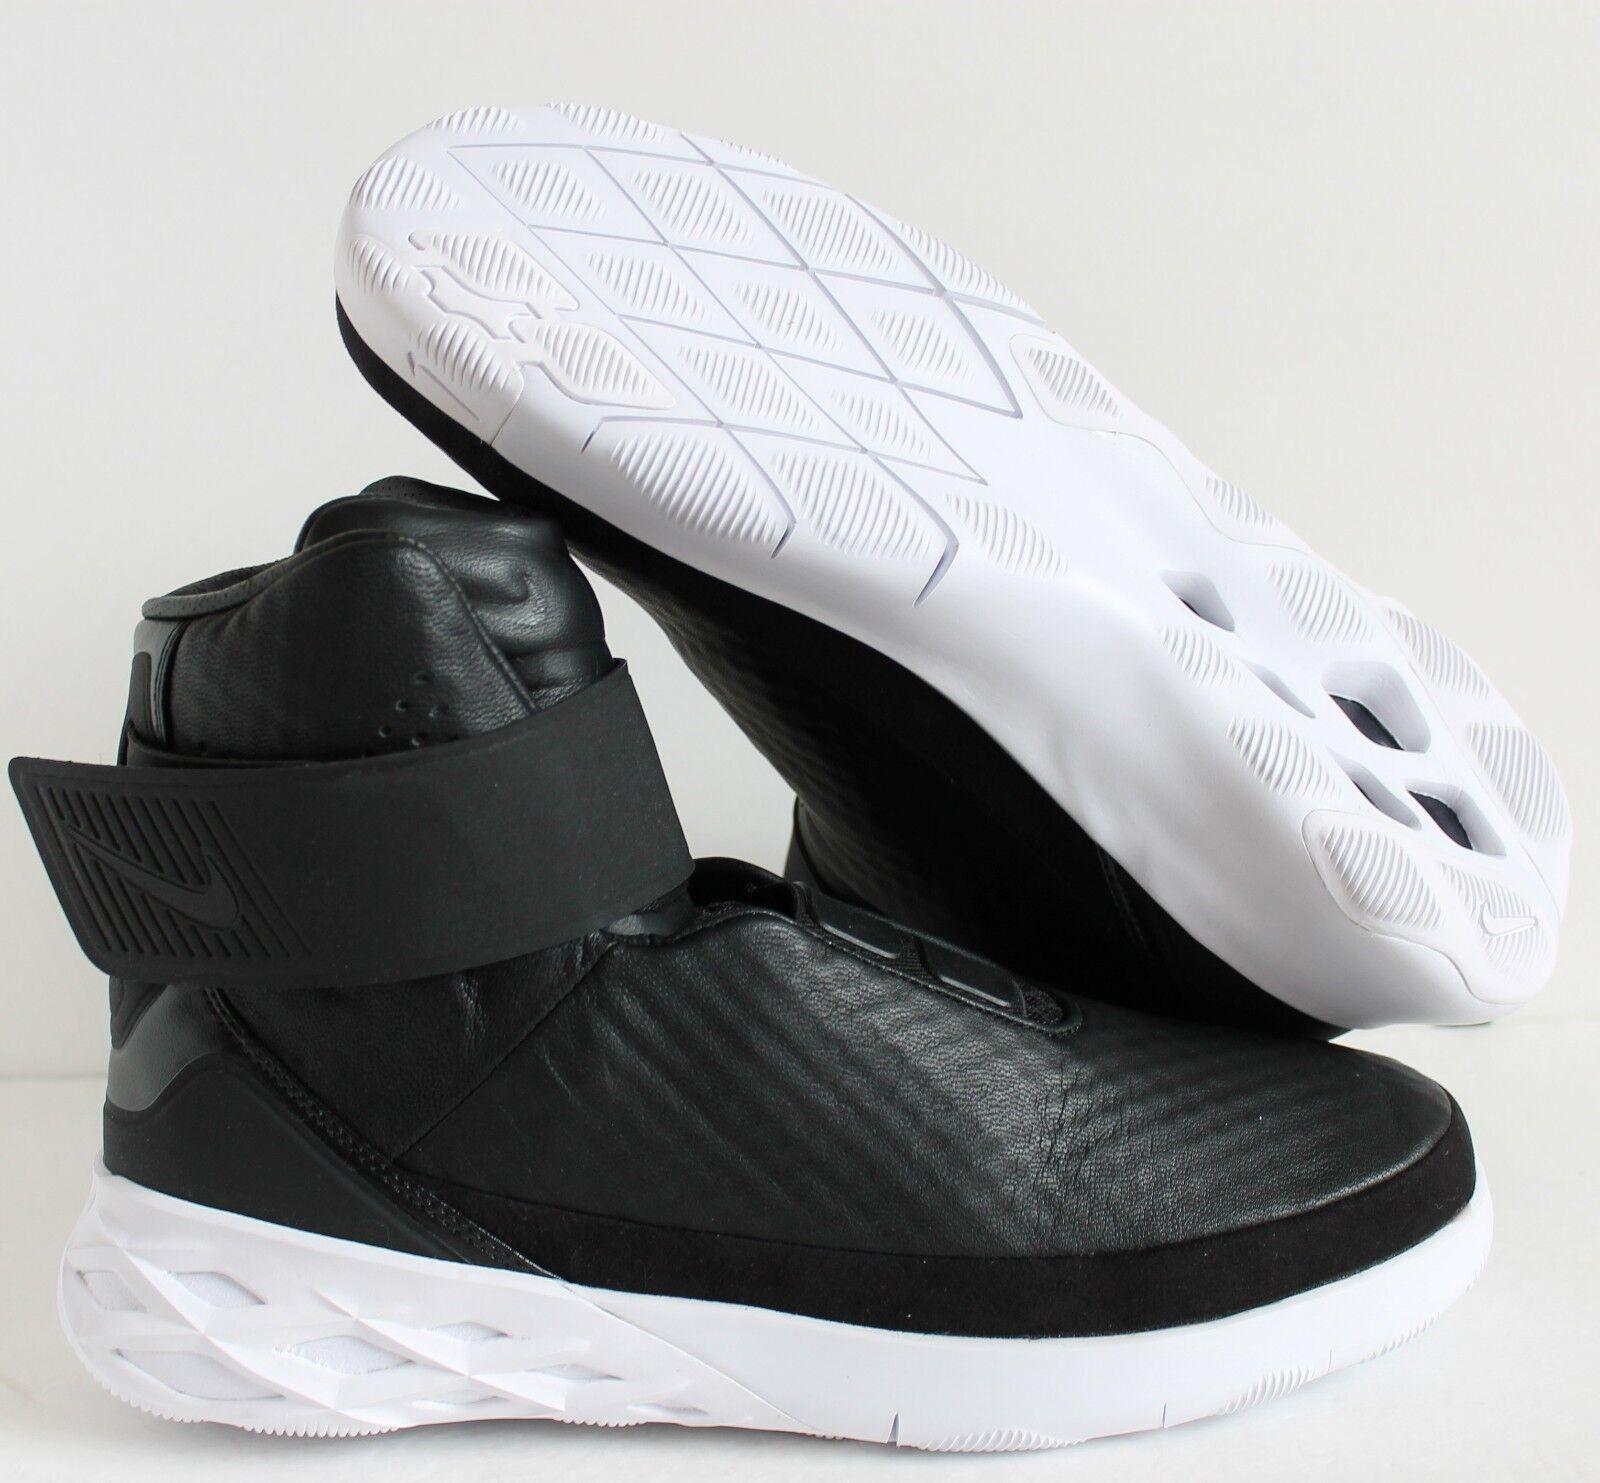 Nike Negro-negro- Hombres Swoosh hntr Hunter Negro-negro- Nike blanco o [832820-001] 7069c4